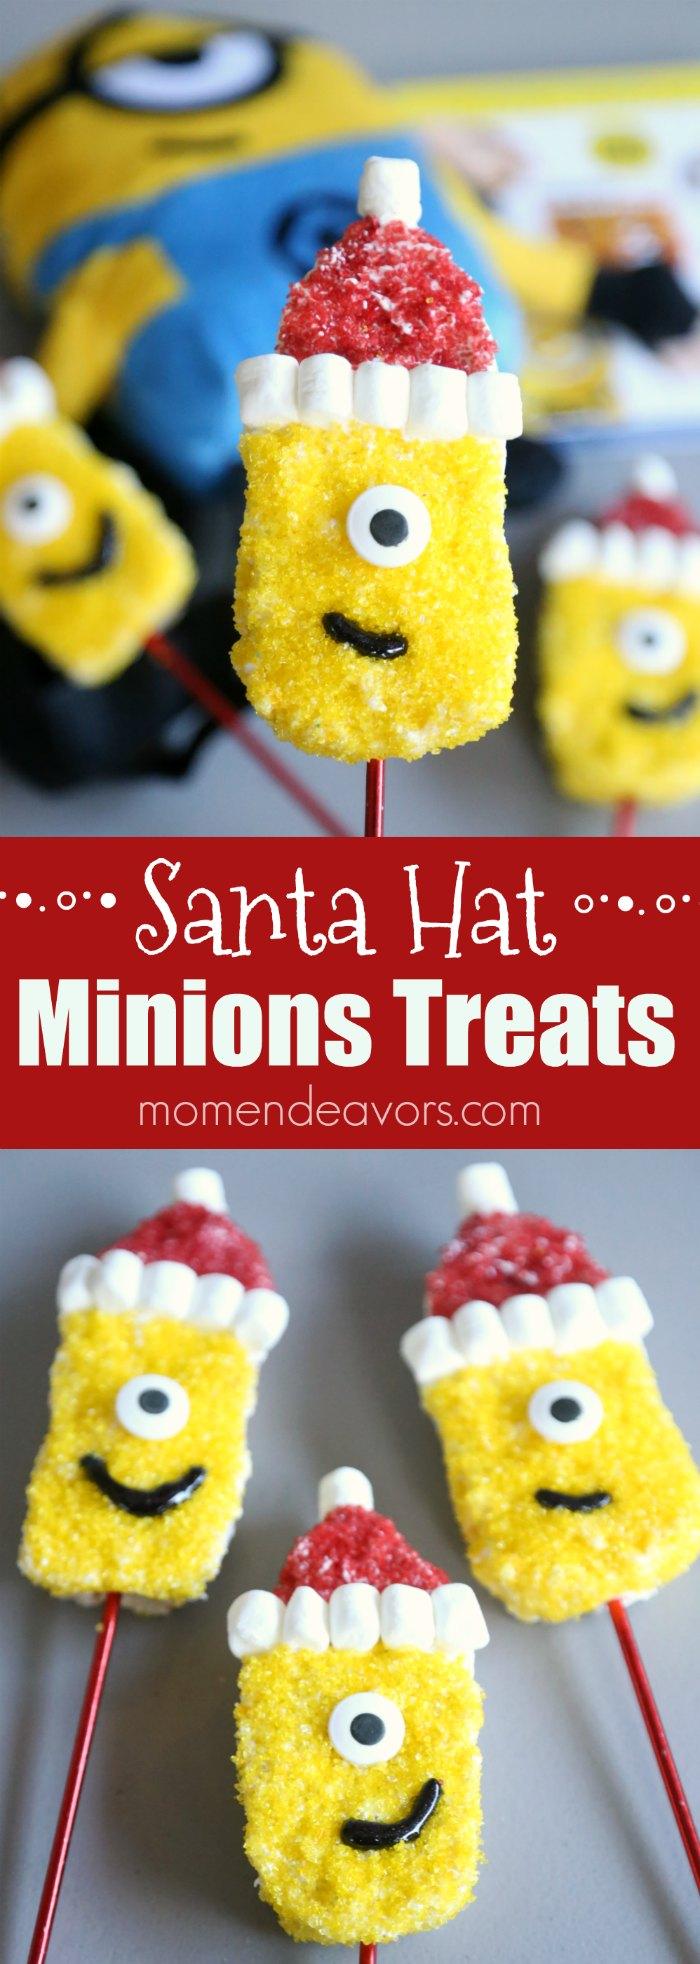 Santa Hat Minions Treats